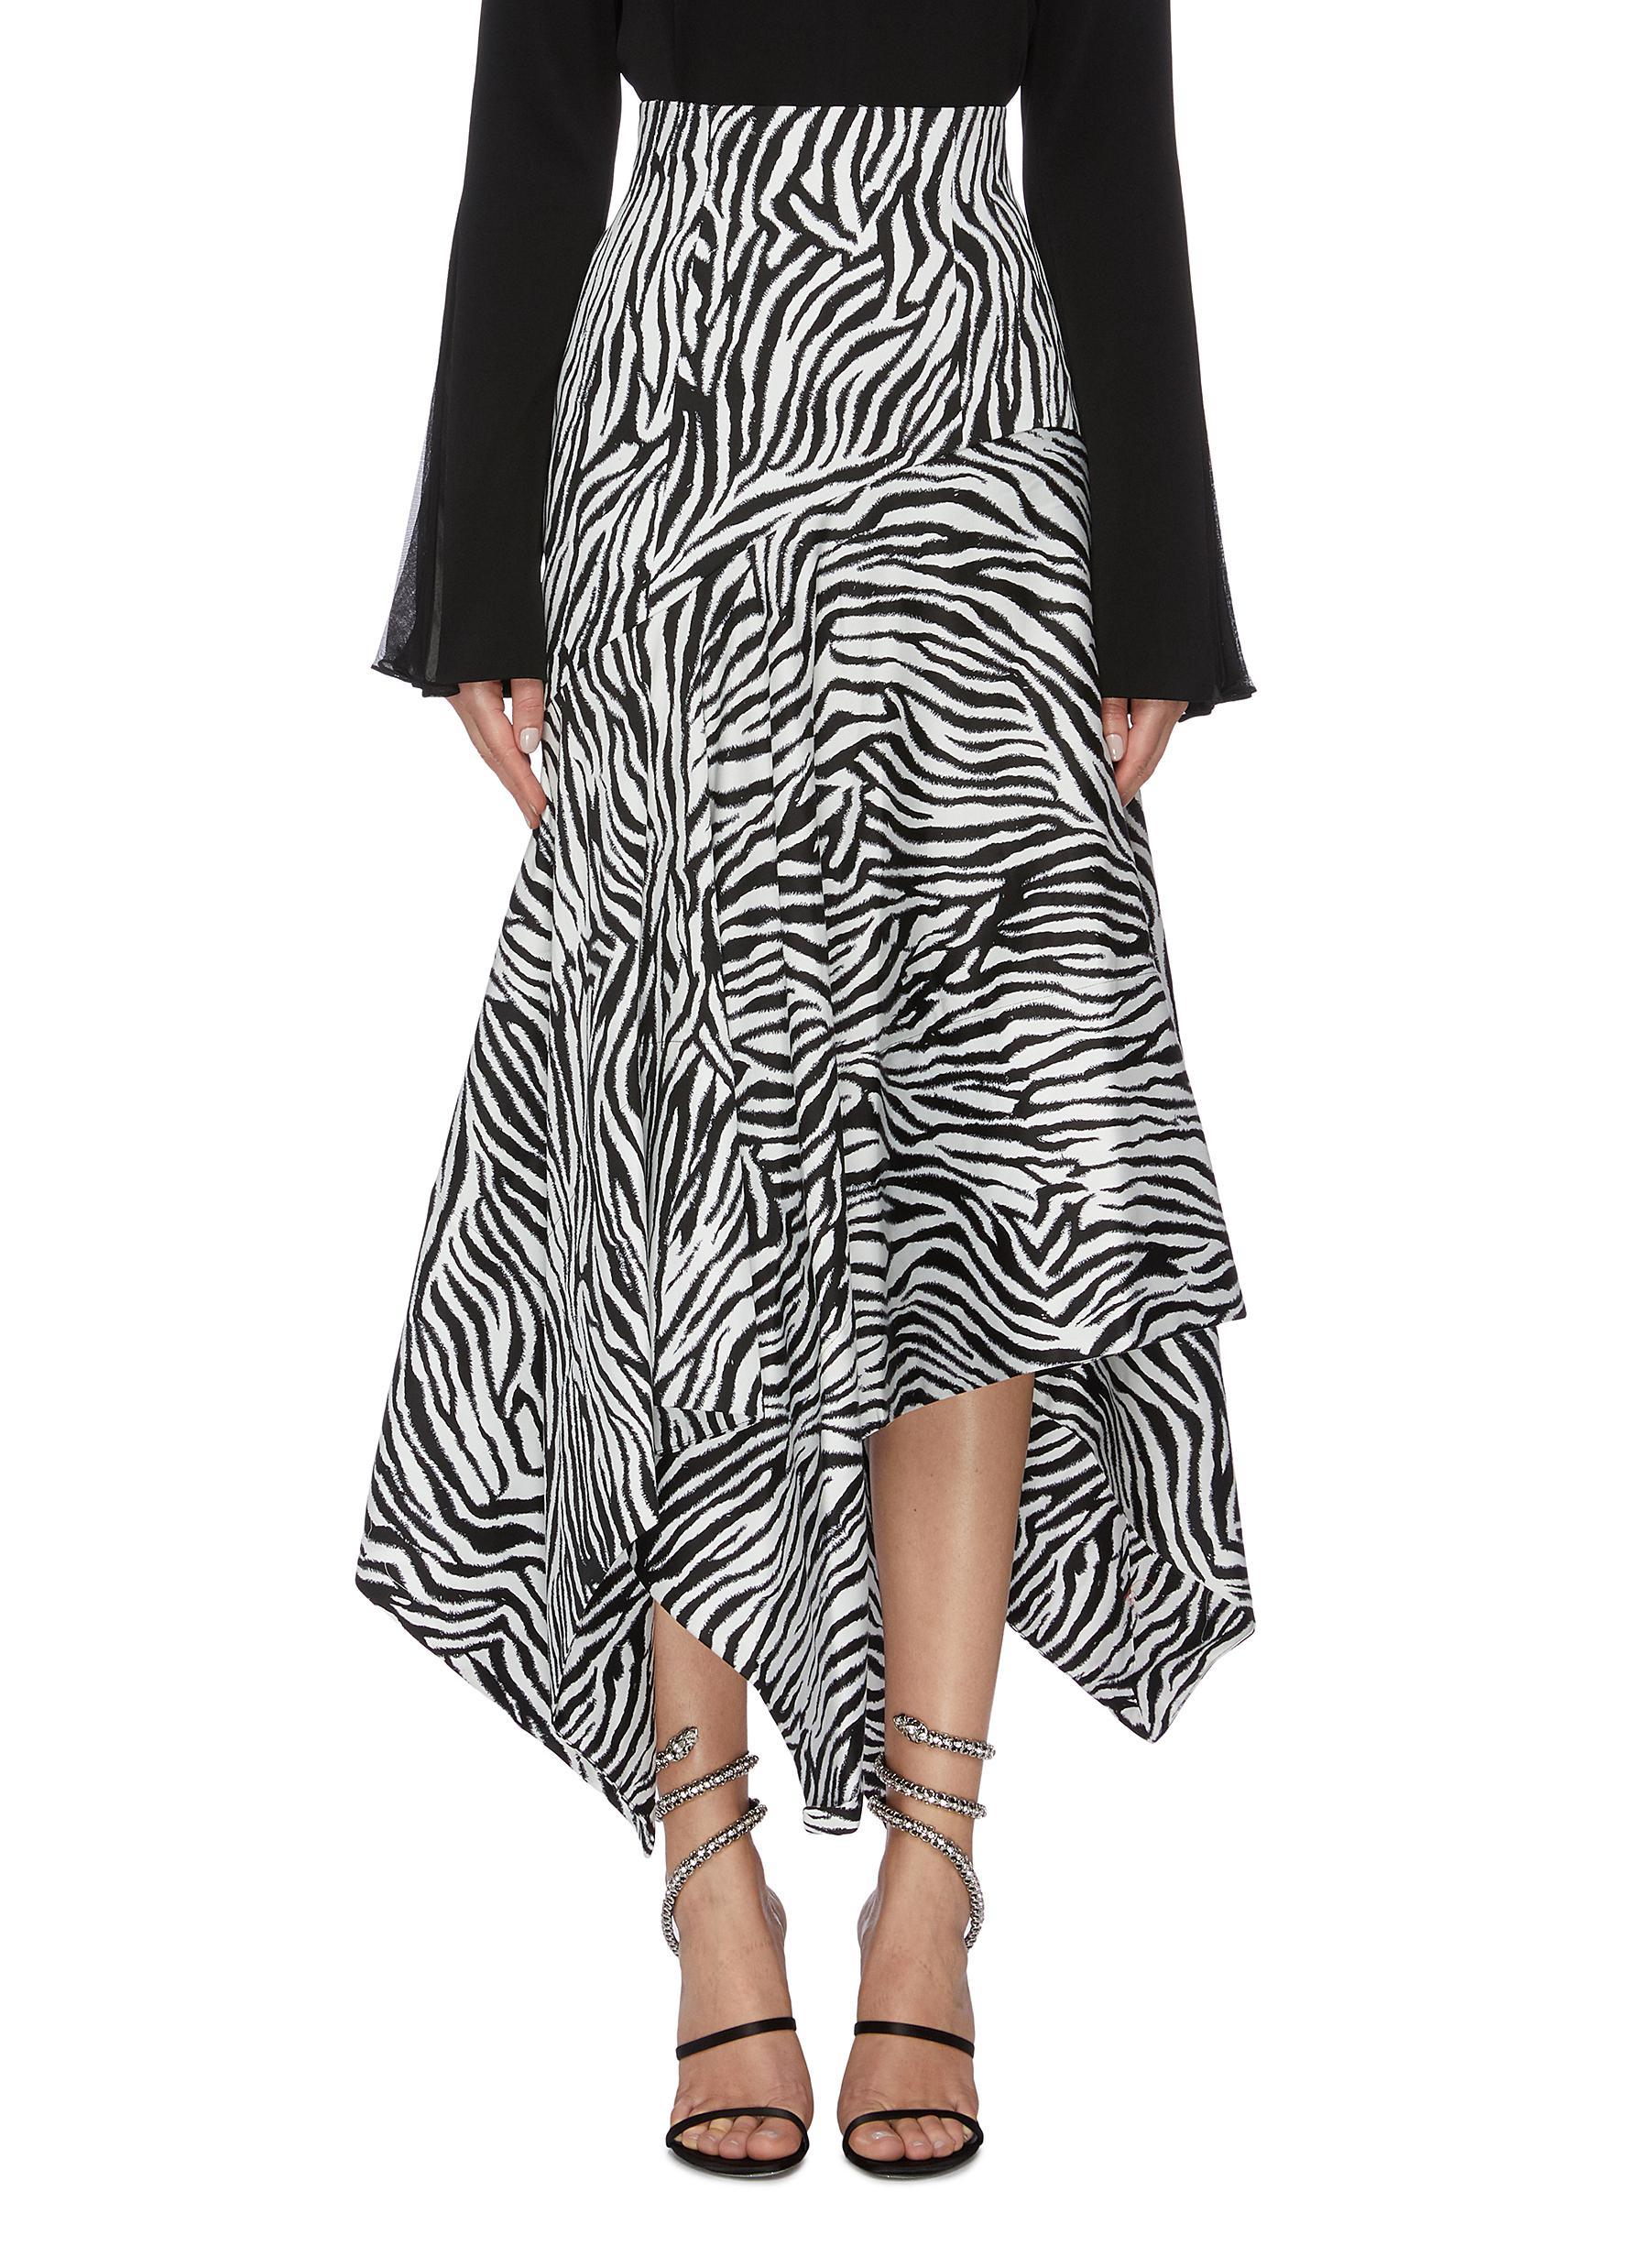 Lonnie zebra stripe asymmetric handkerchief skirt by Solace London